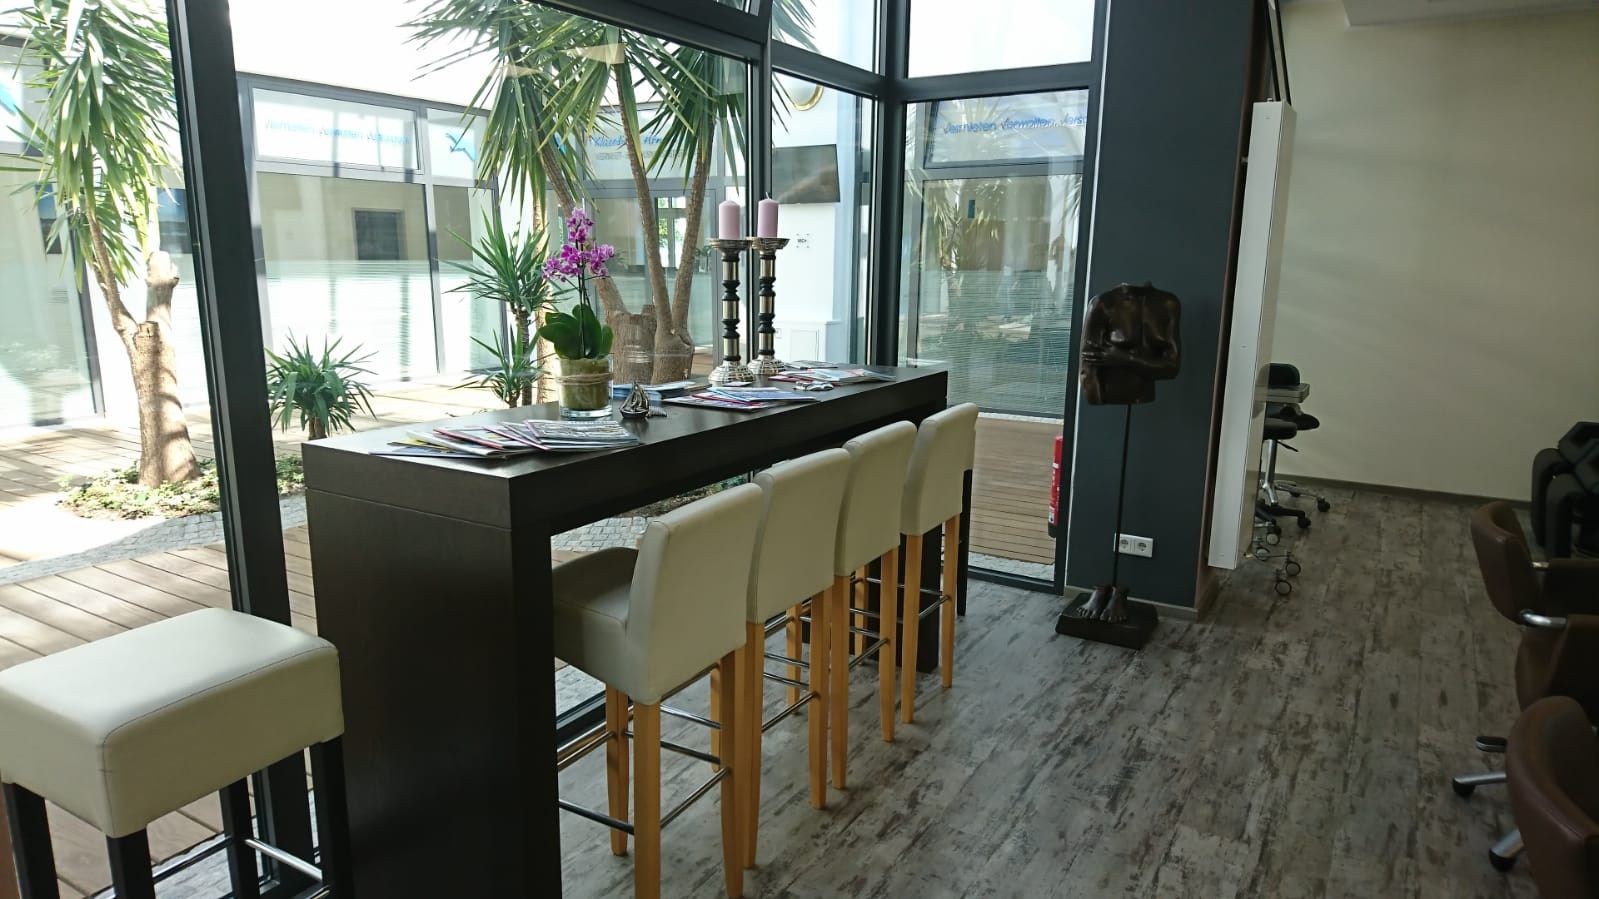 crehaartive - Friseur Norderney - Raesfeld - Erle